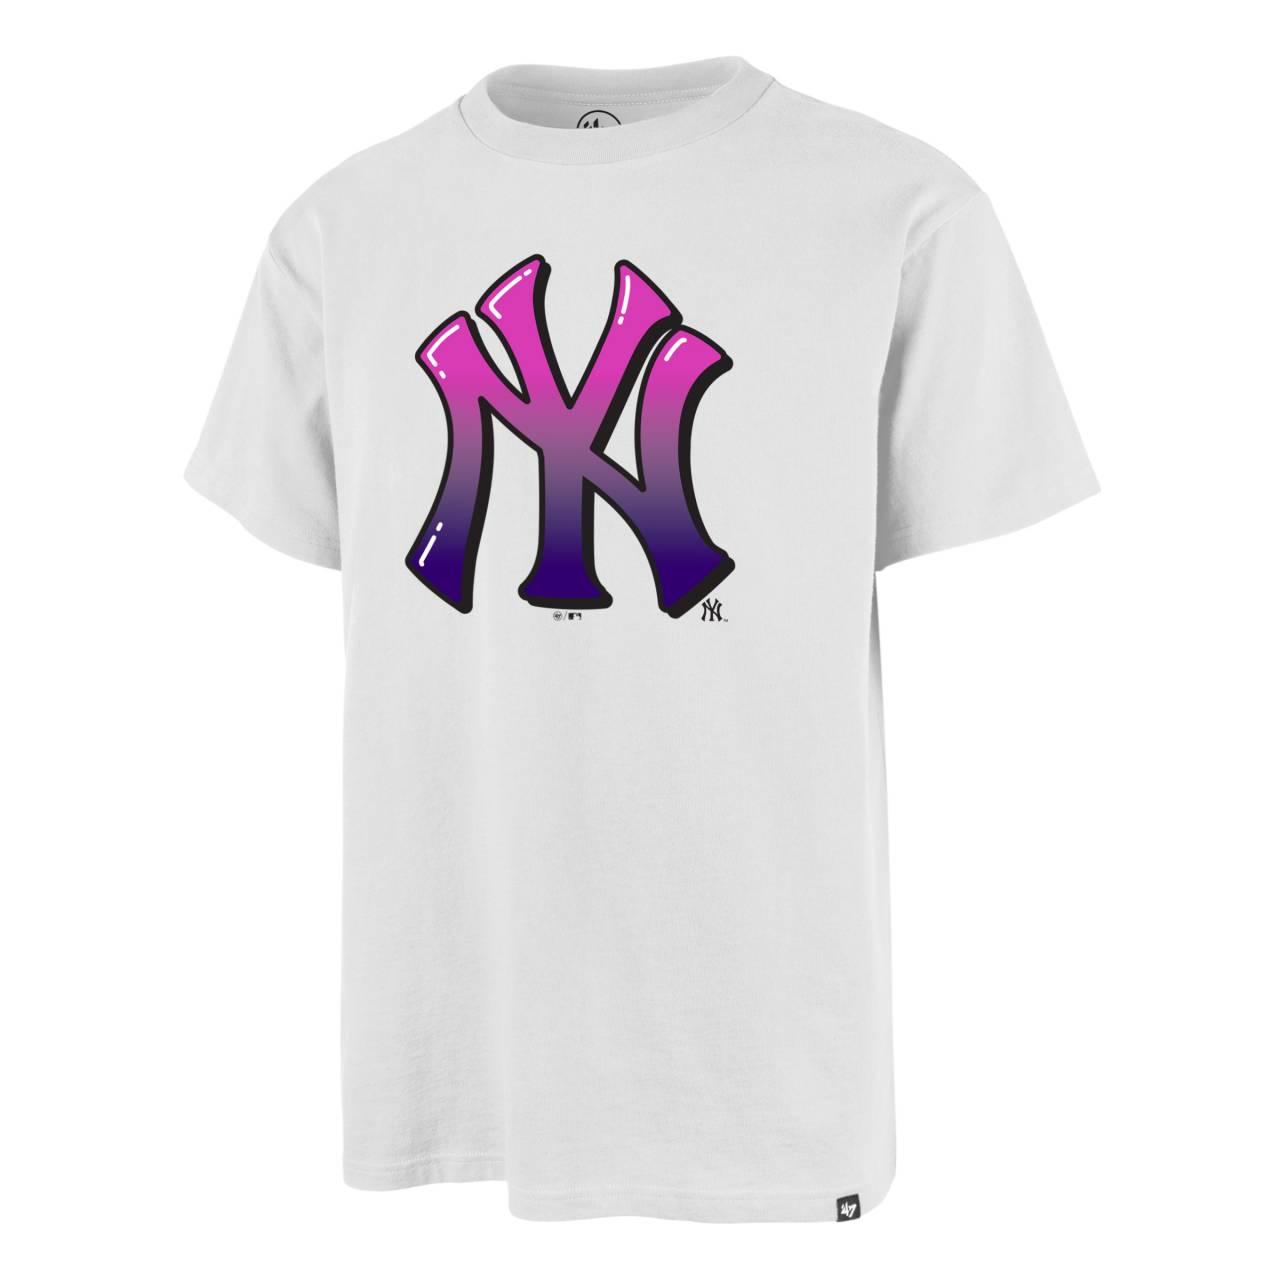 T-SHIRT MLB NEW YORK YANKEES LOGO WEISS